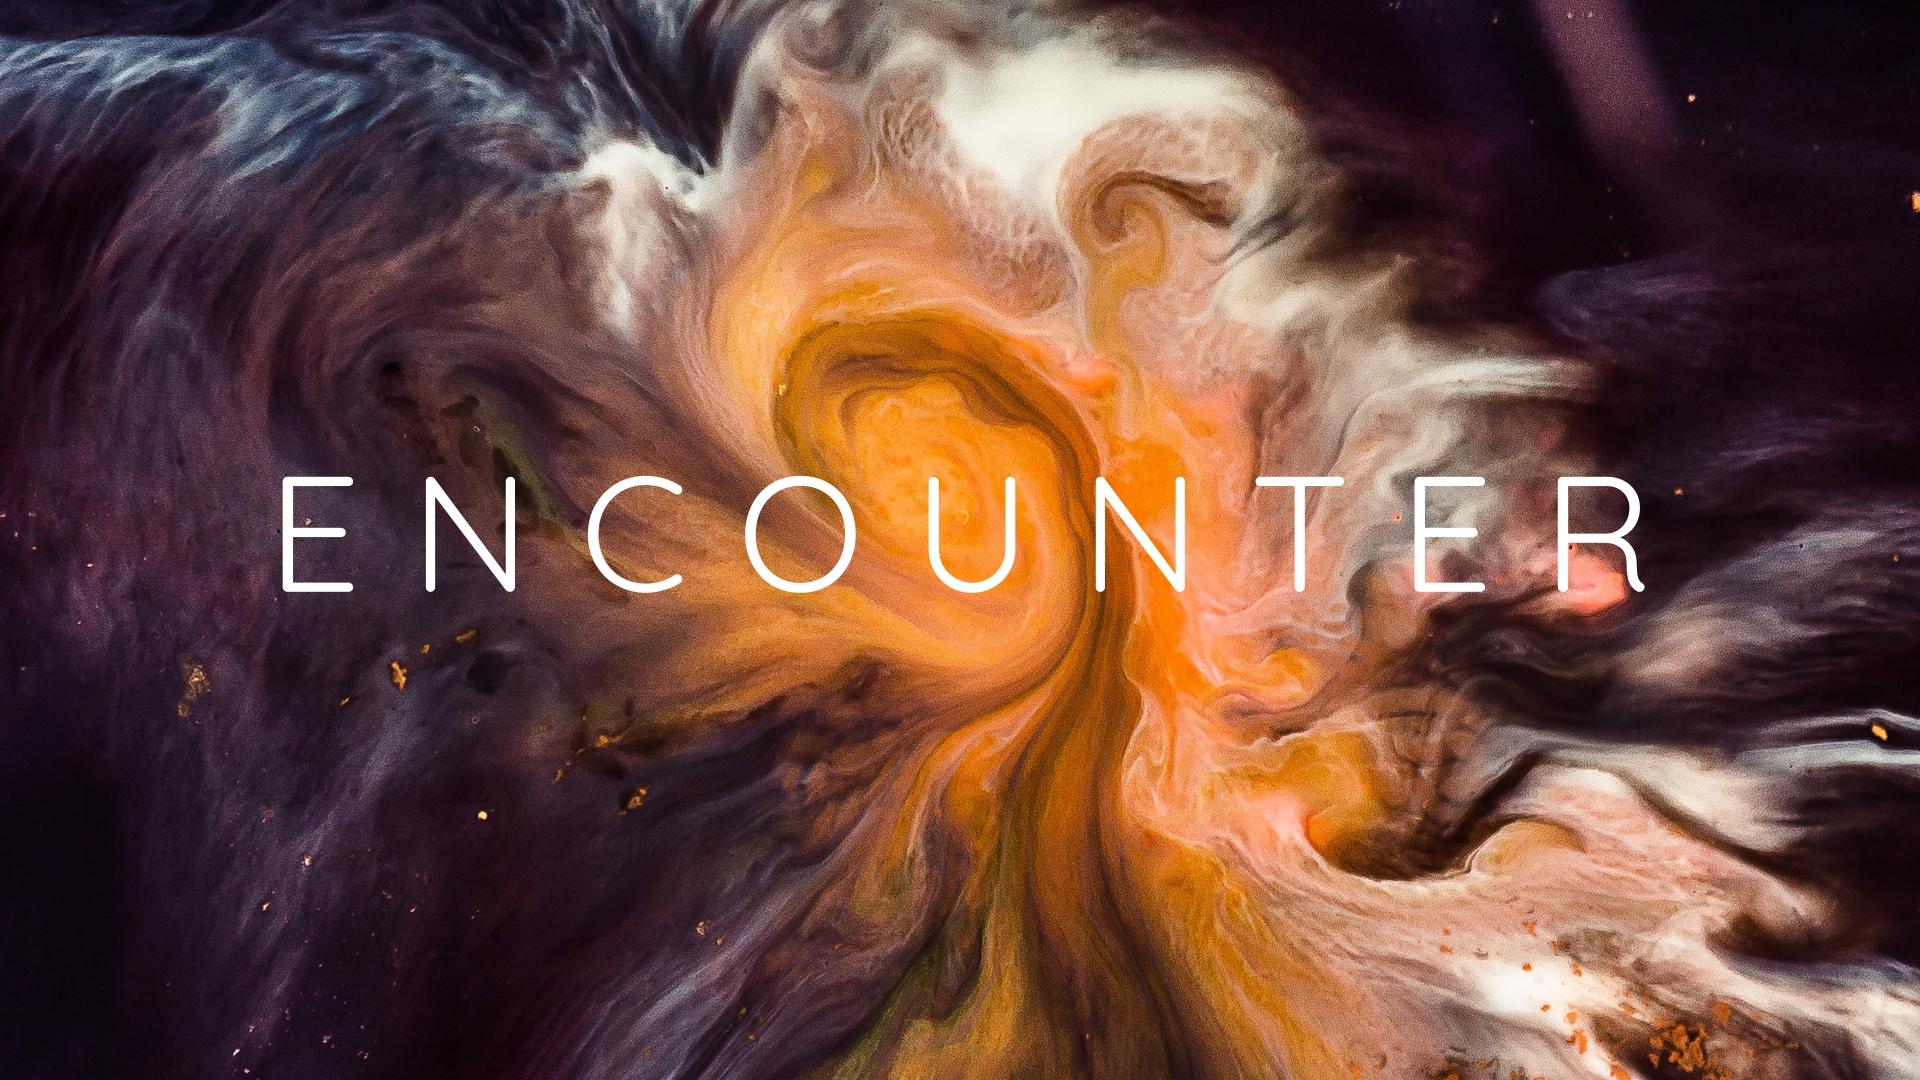 Encounter - Title.jpg